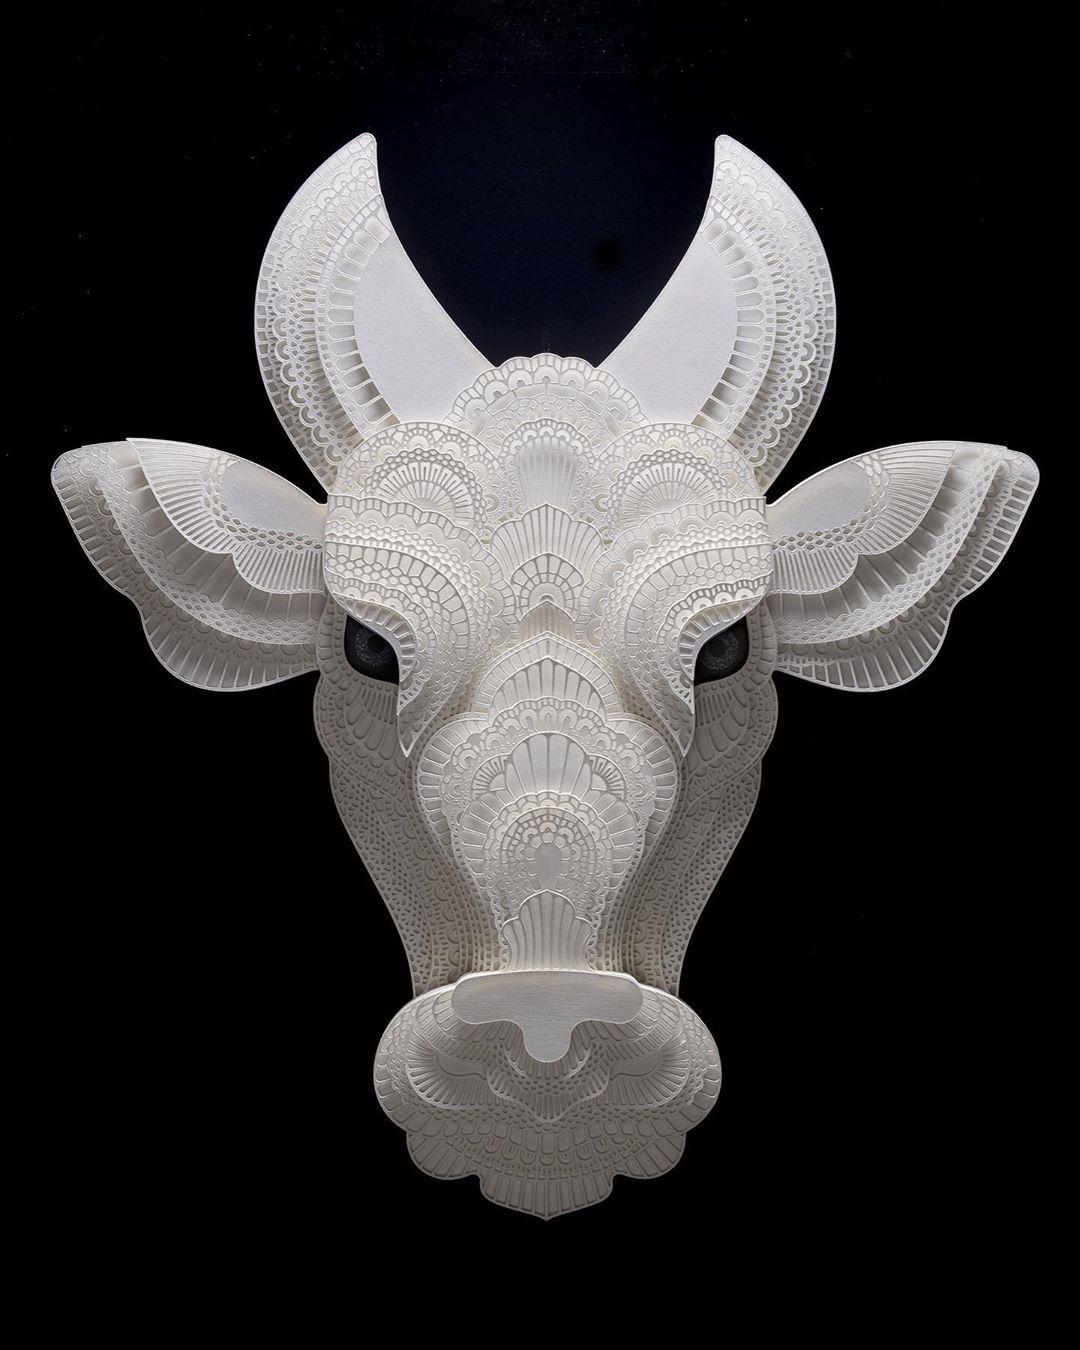 Filipino Sculptor Creates Public Awareness About Endangered Species Through Cut Paper Sculptures 4